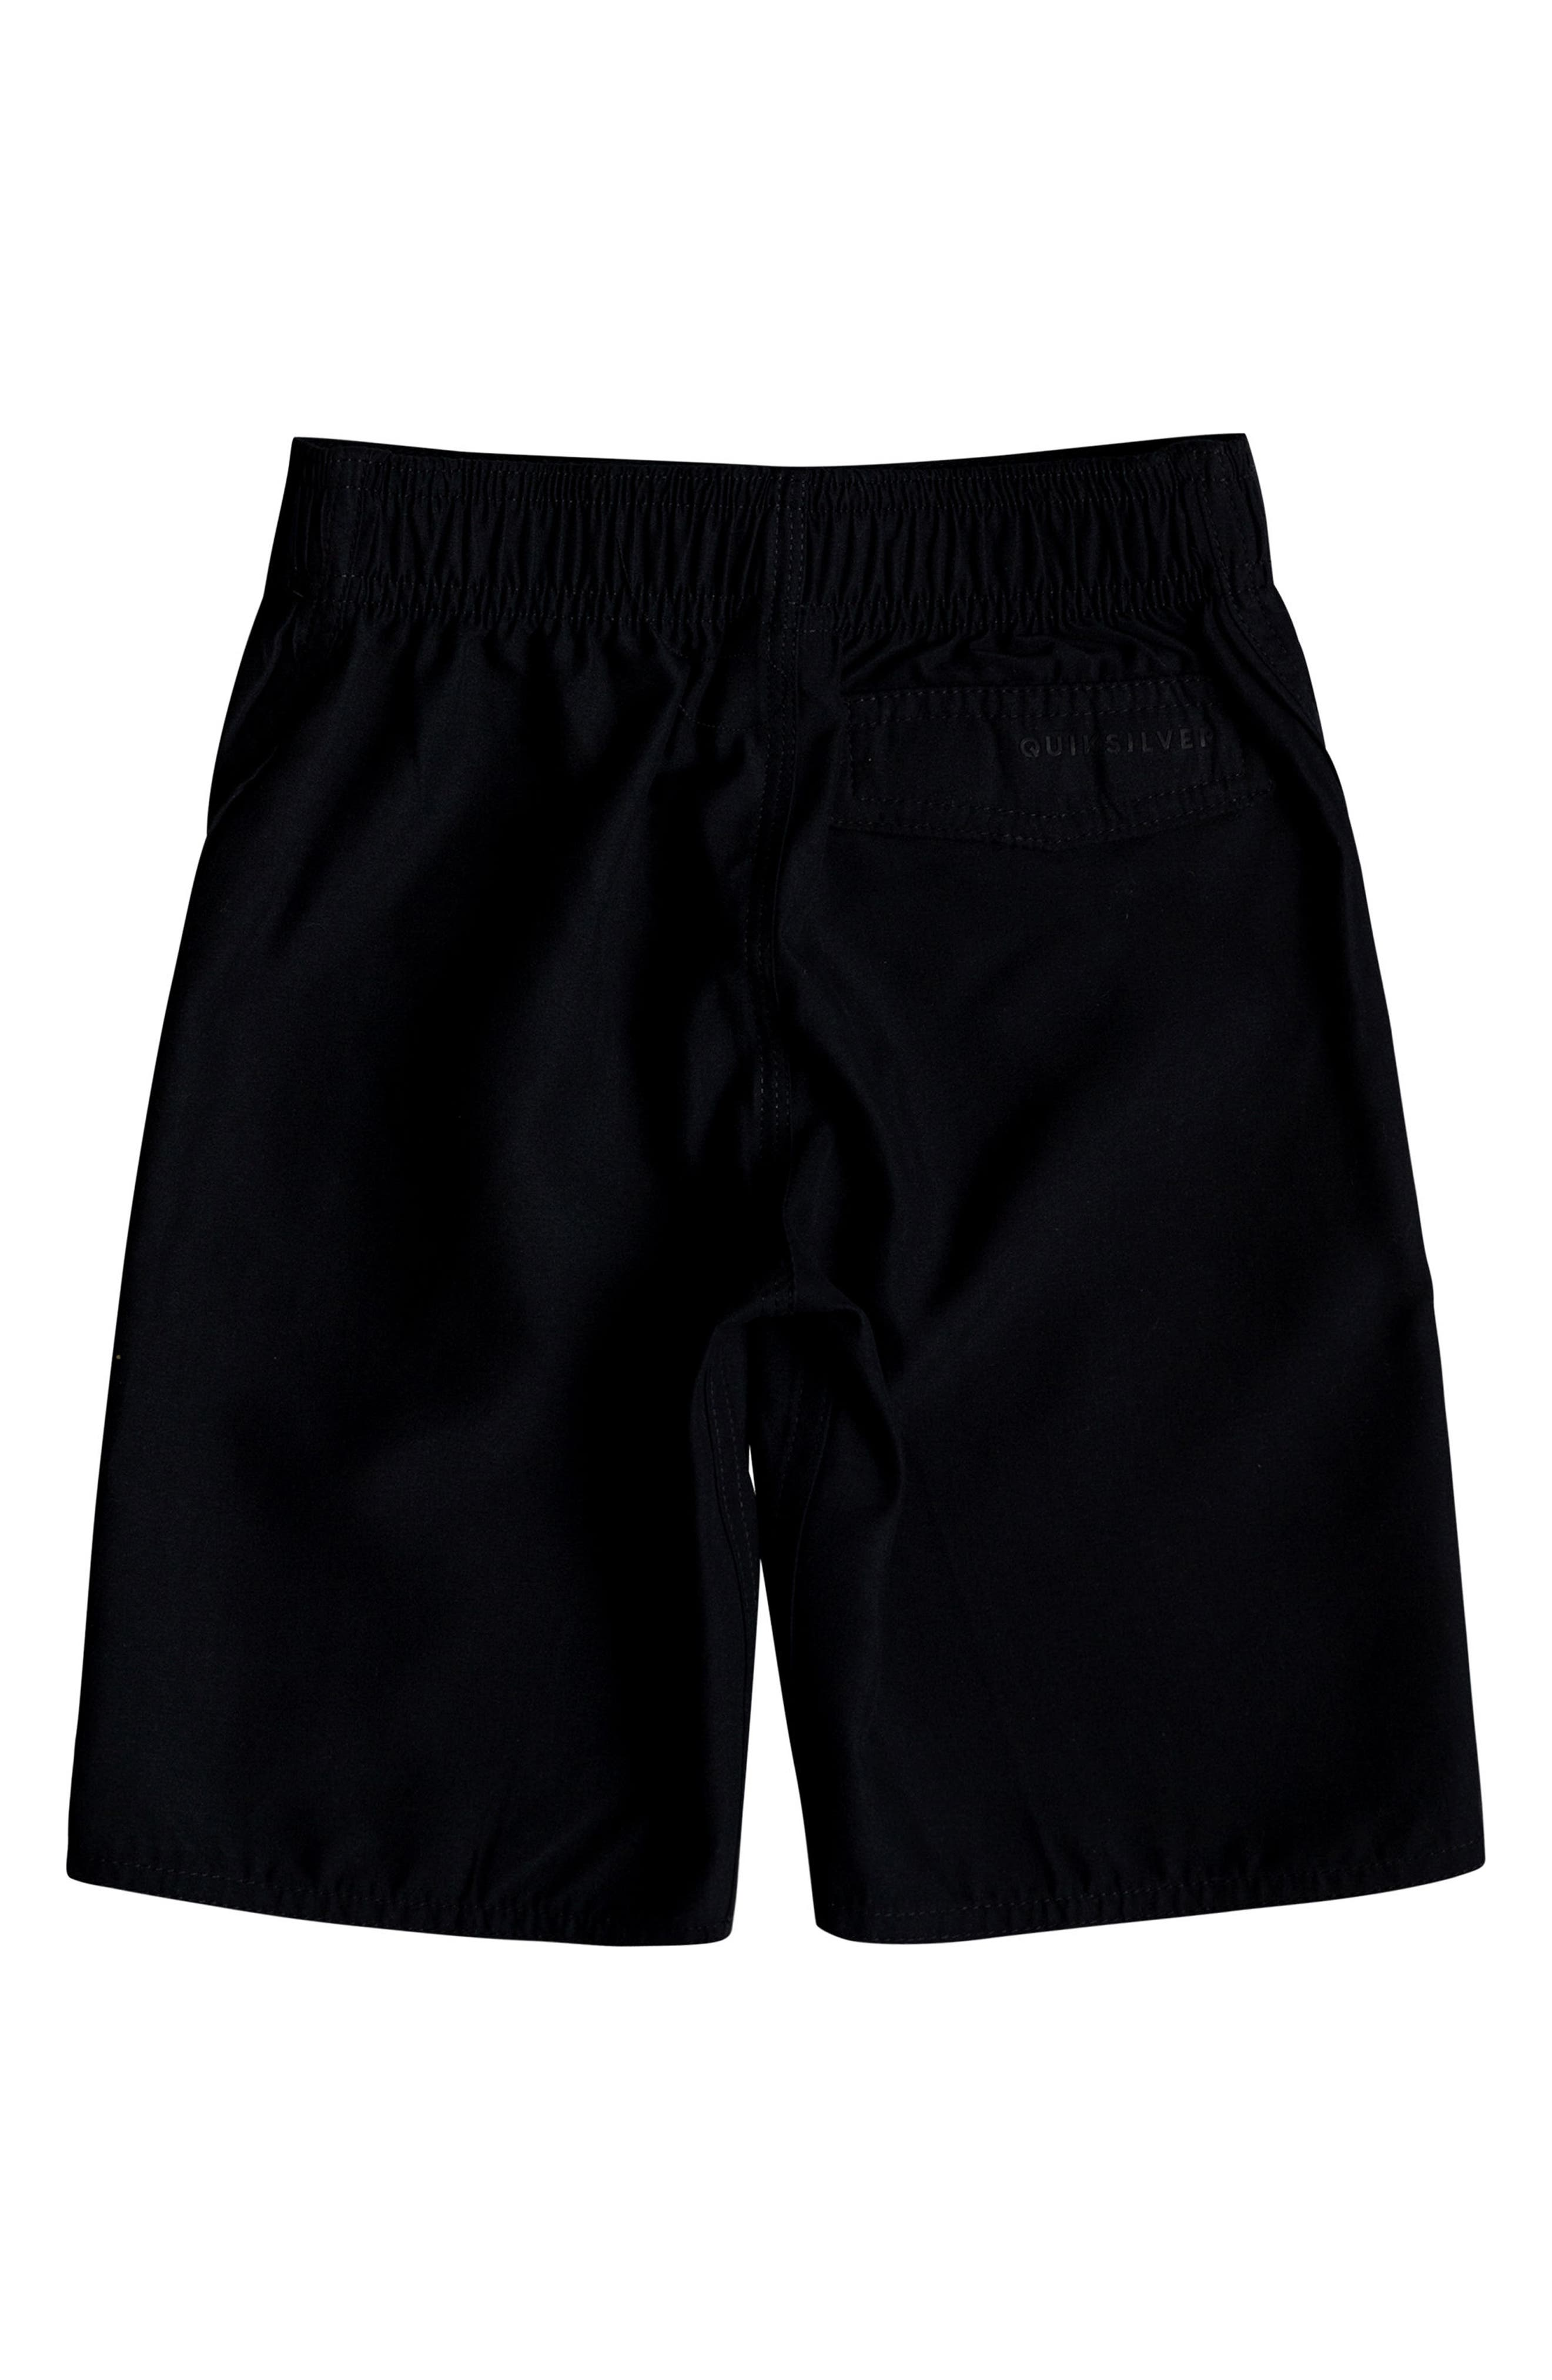 Highline Kaimana Board Shorts,                             Alternate thumbnail 2, color,                             Black